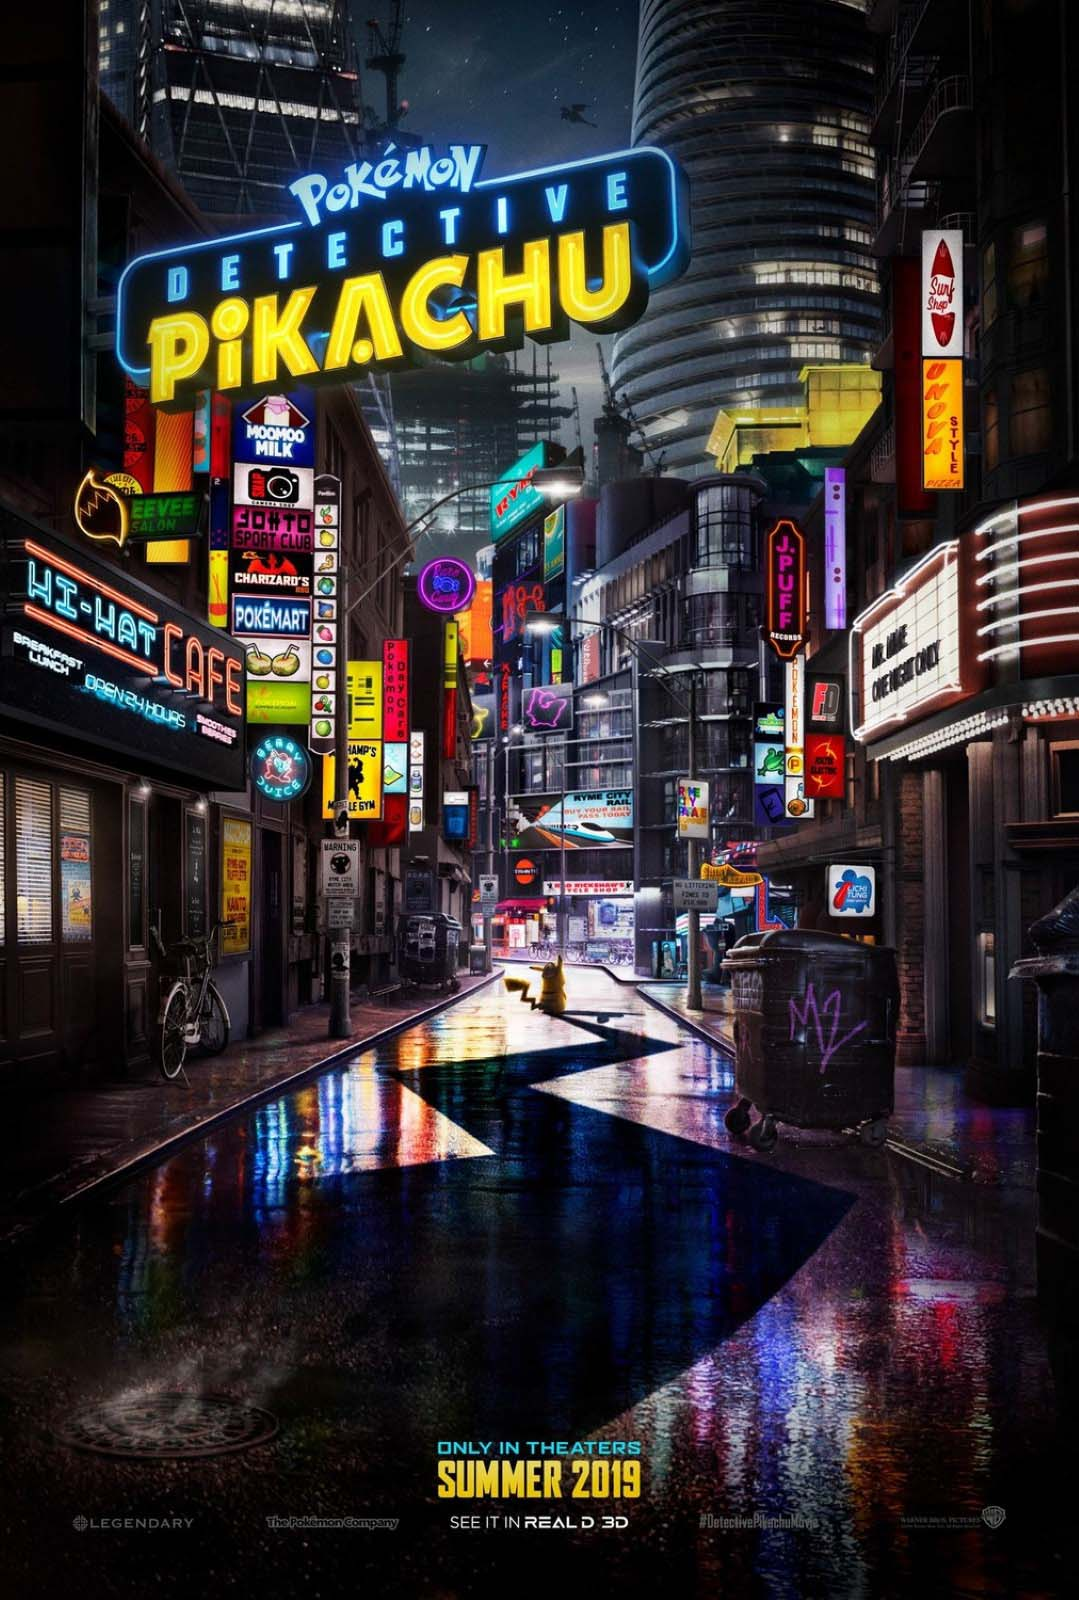 Pokémon Detective pikachu (2019) Movie Free Online